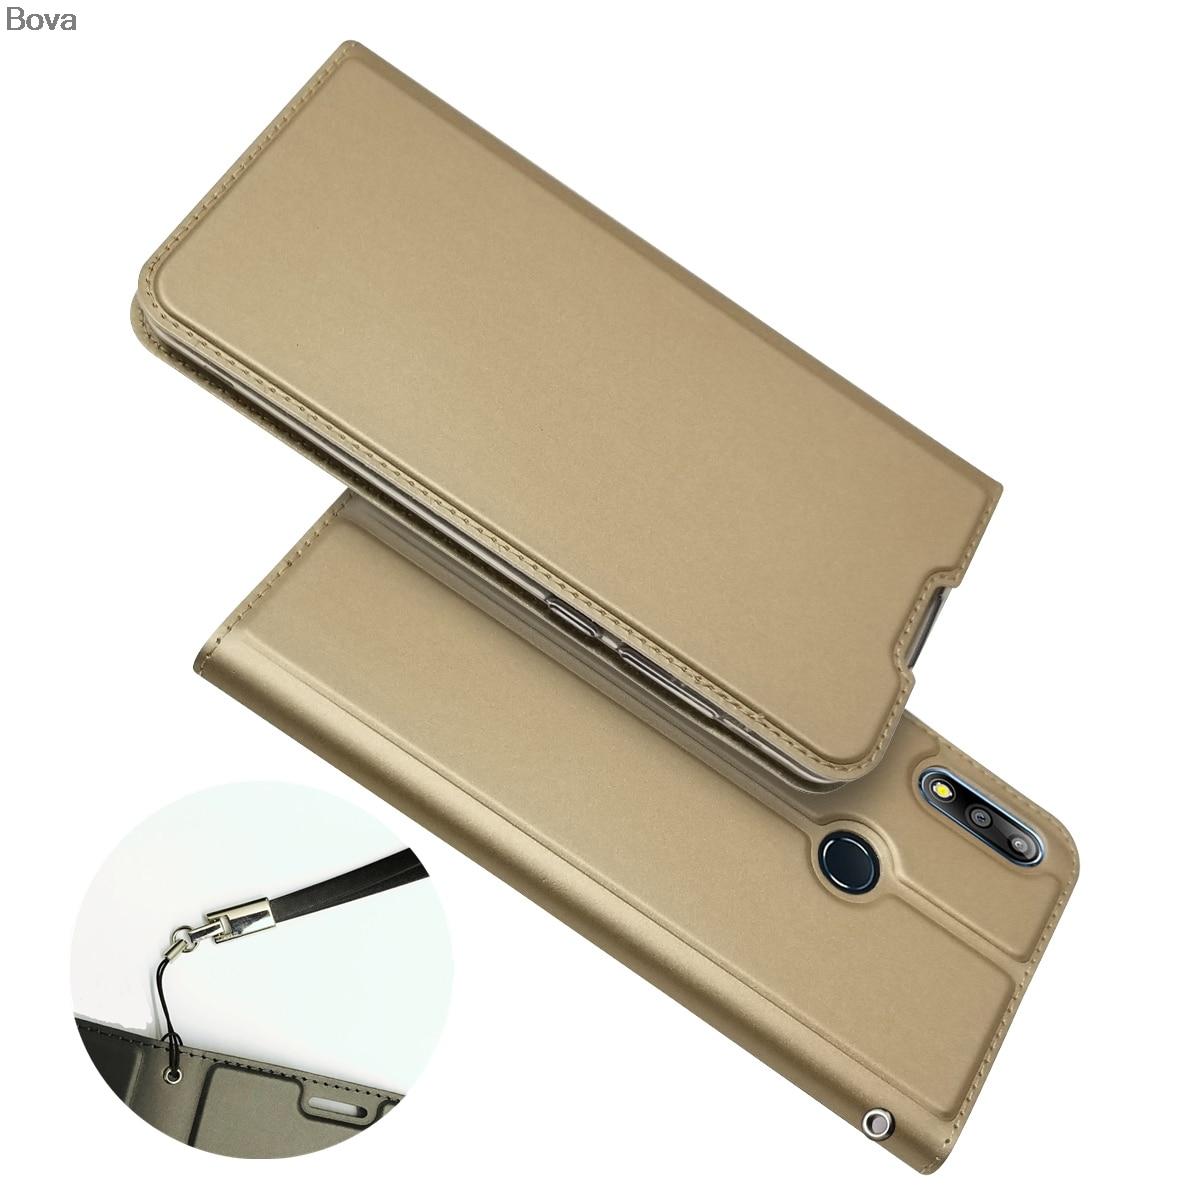 Funda tipo billetera para Asus Zenfone Max Pro (M2) ZB631KL a prueba de caídas, funda para teléfono de atracción magnética Ultra fina con tacto mate